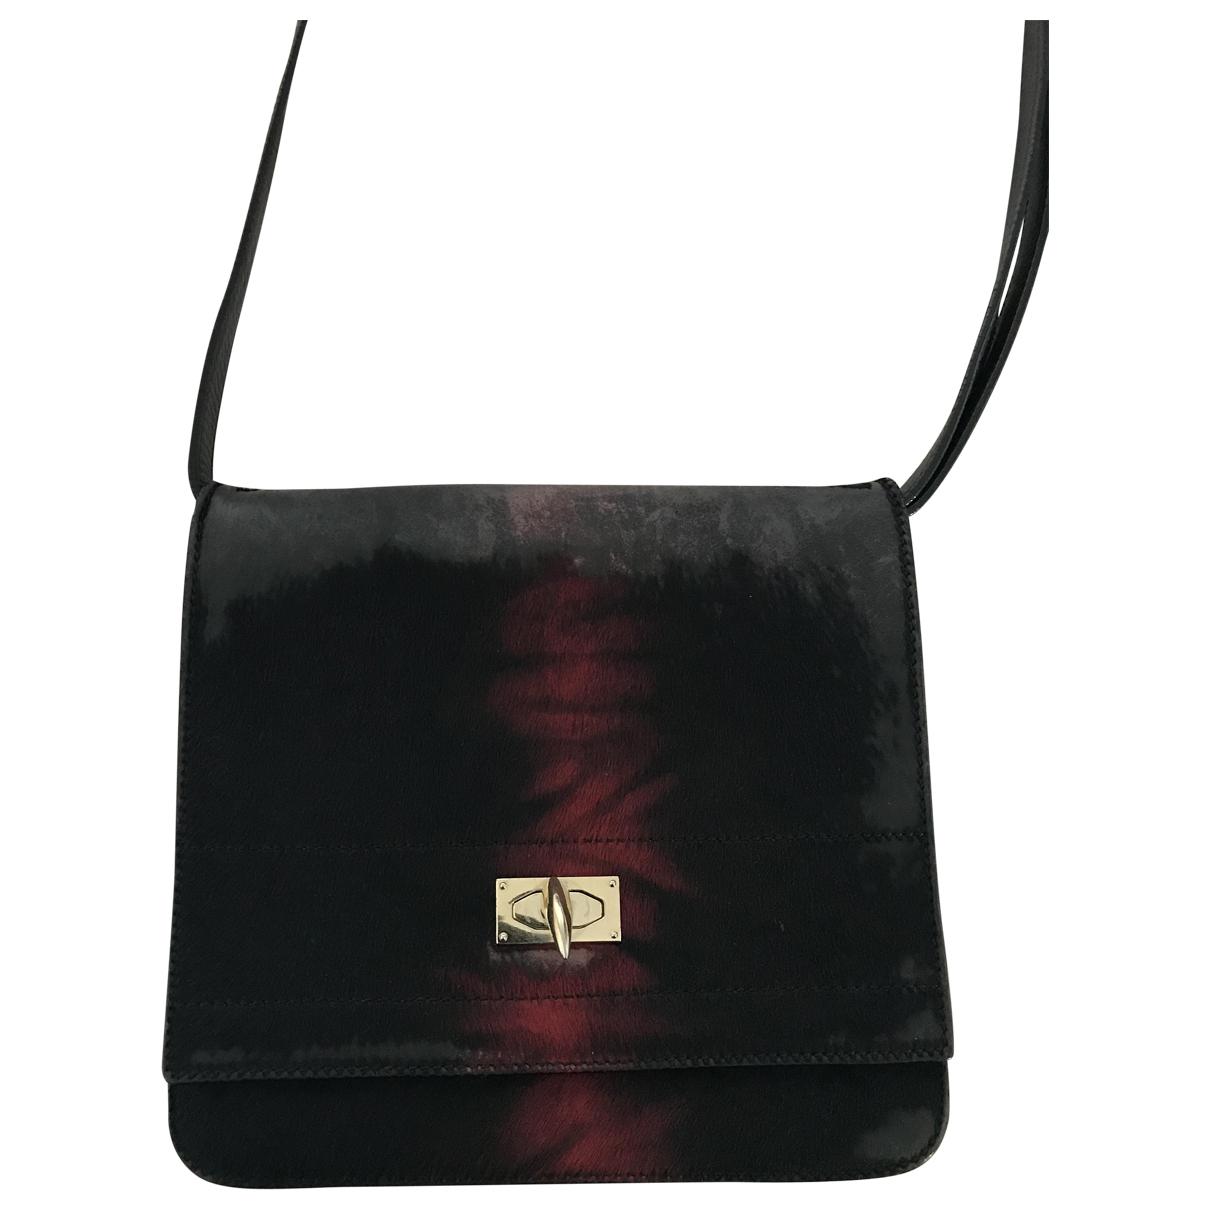 Givenchy Shark Black Pony-style calfskin handbag for Women \N